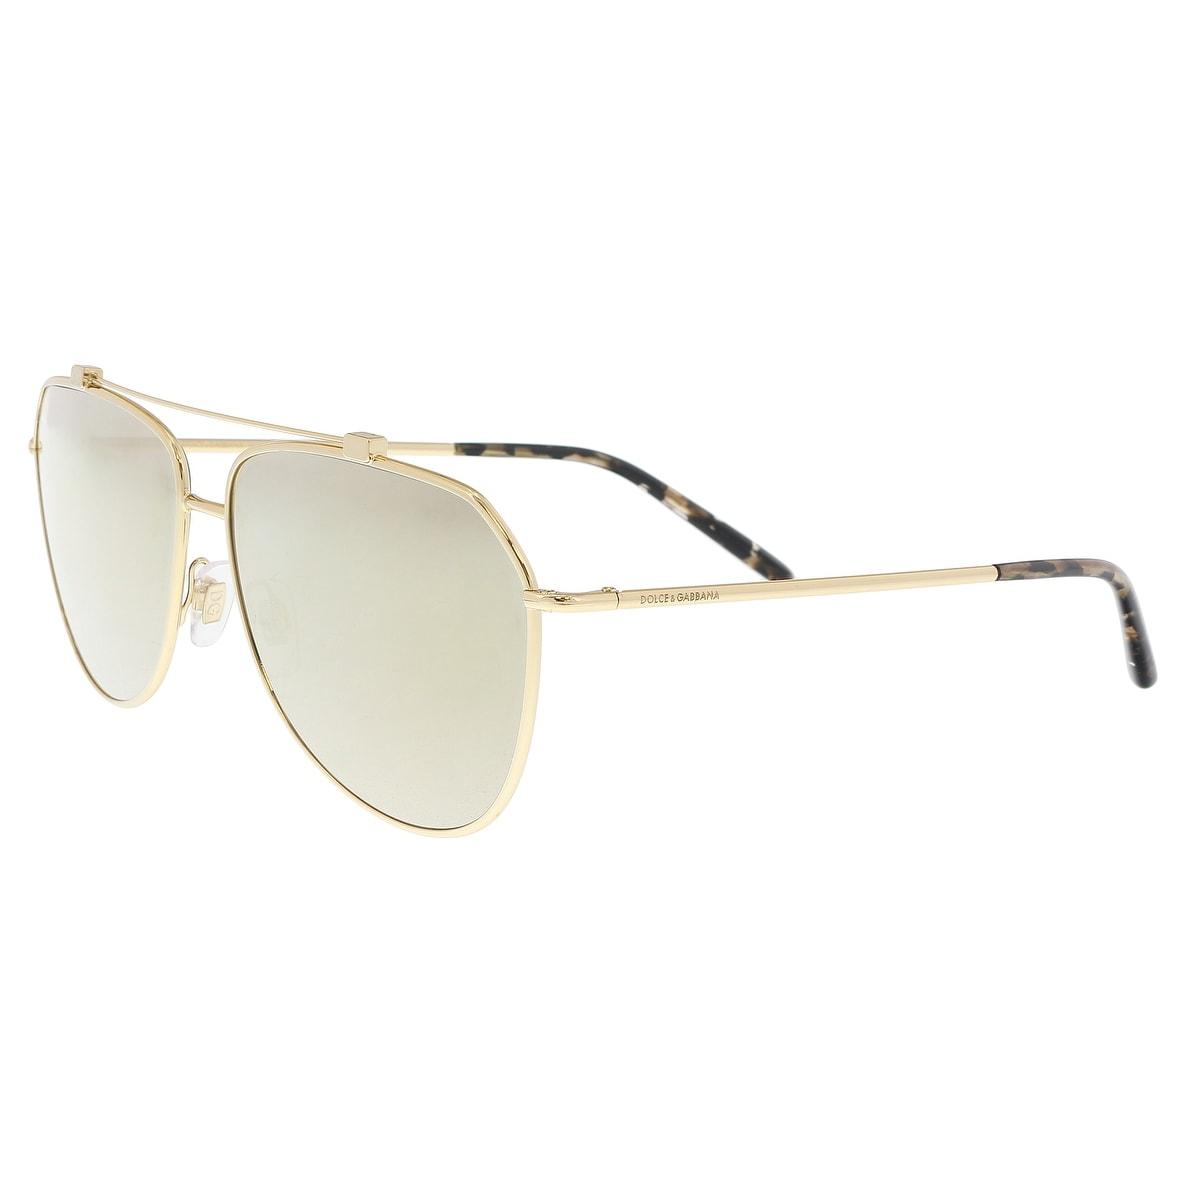 810fa87b1bf Dolce   Gabbana Men s Sunglasses